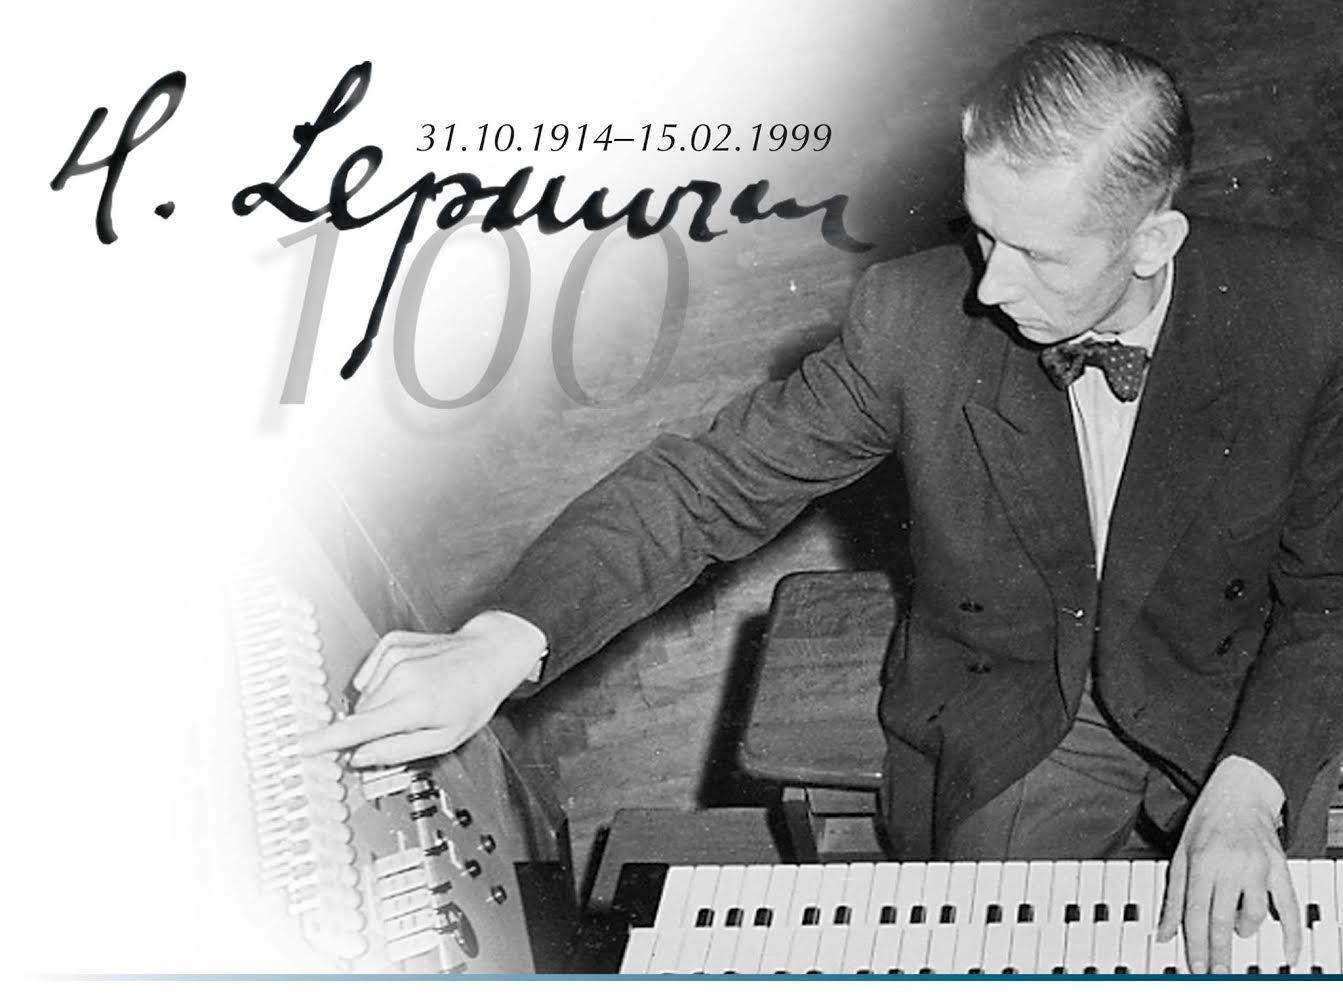 lepnurm-100.jpg